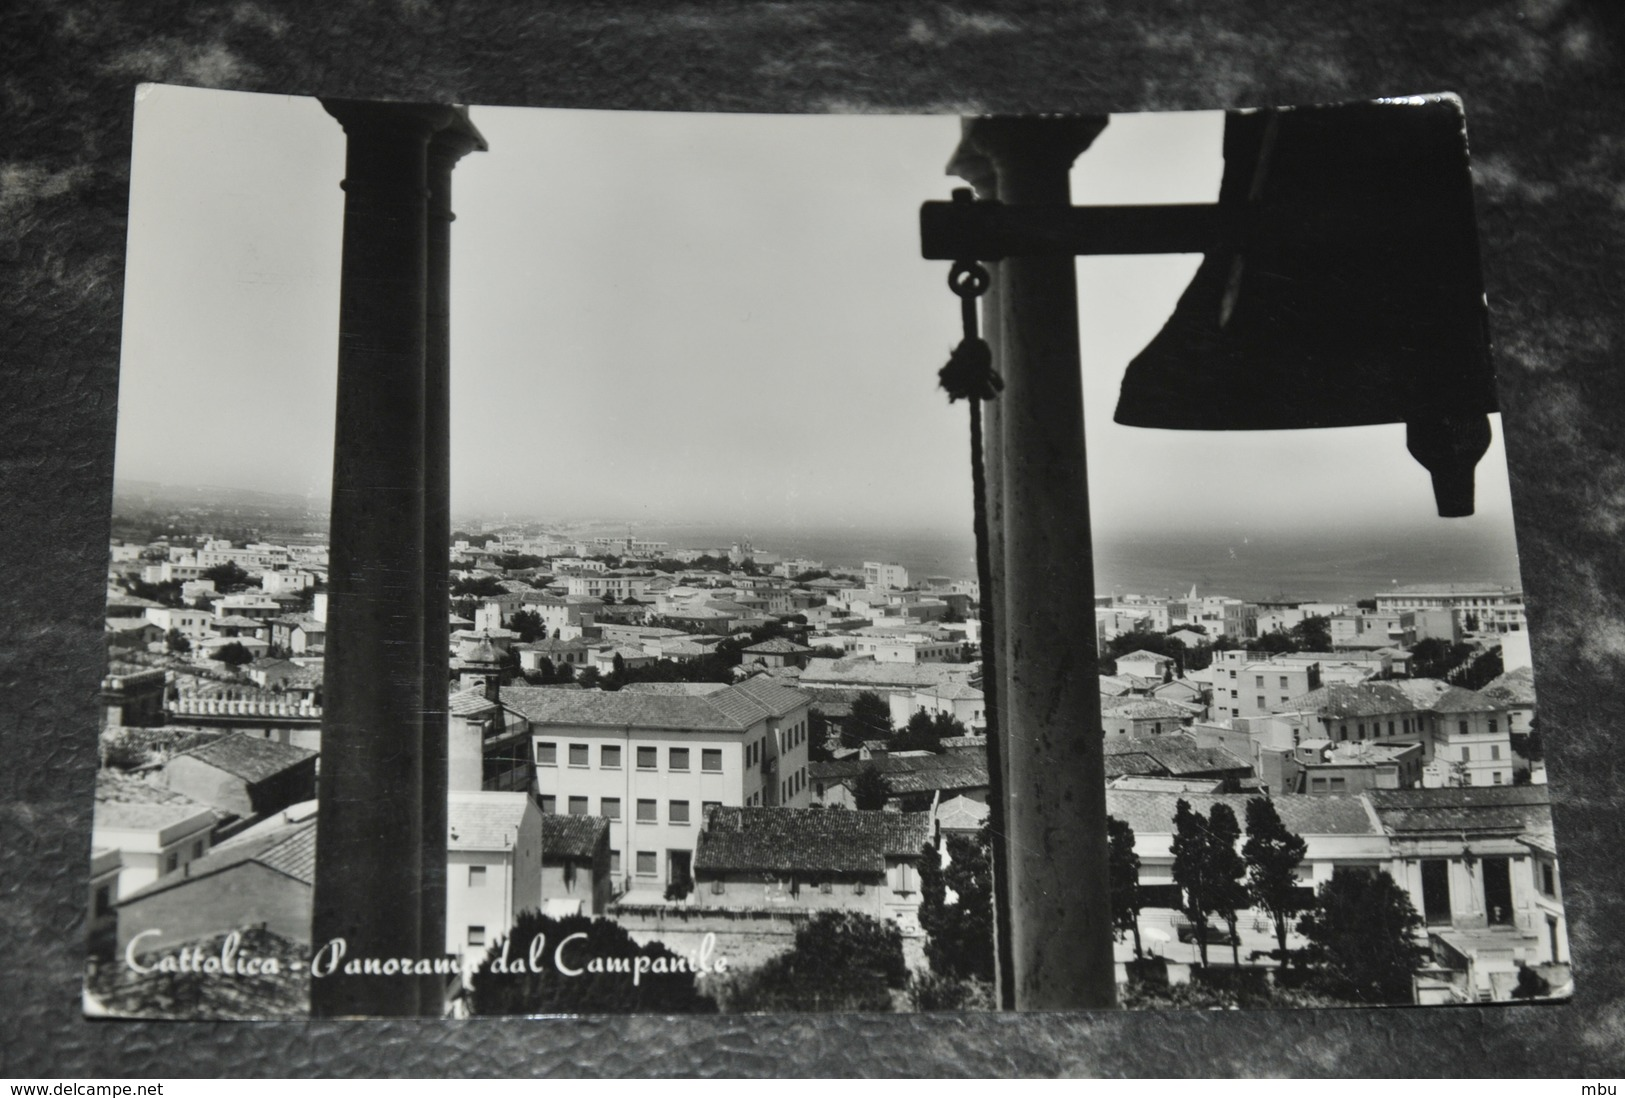 3369   CATTOLICA - Panorama Dal Campanile - Autres Villes